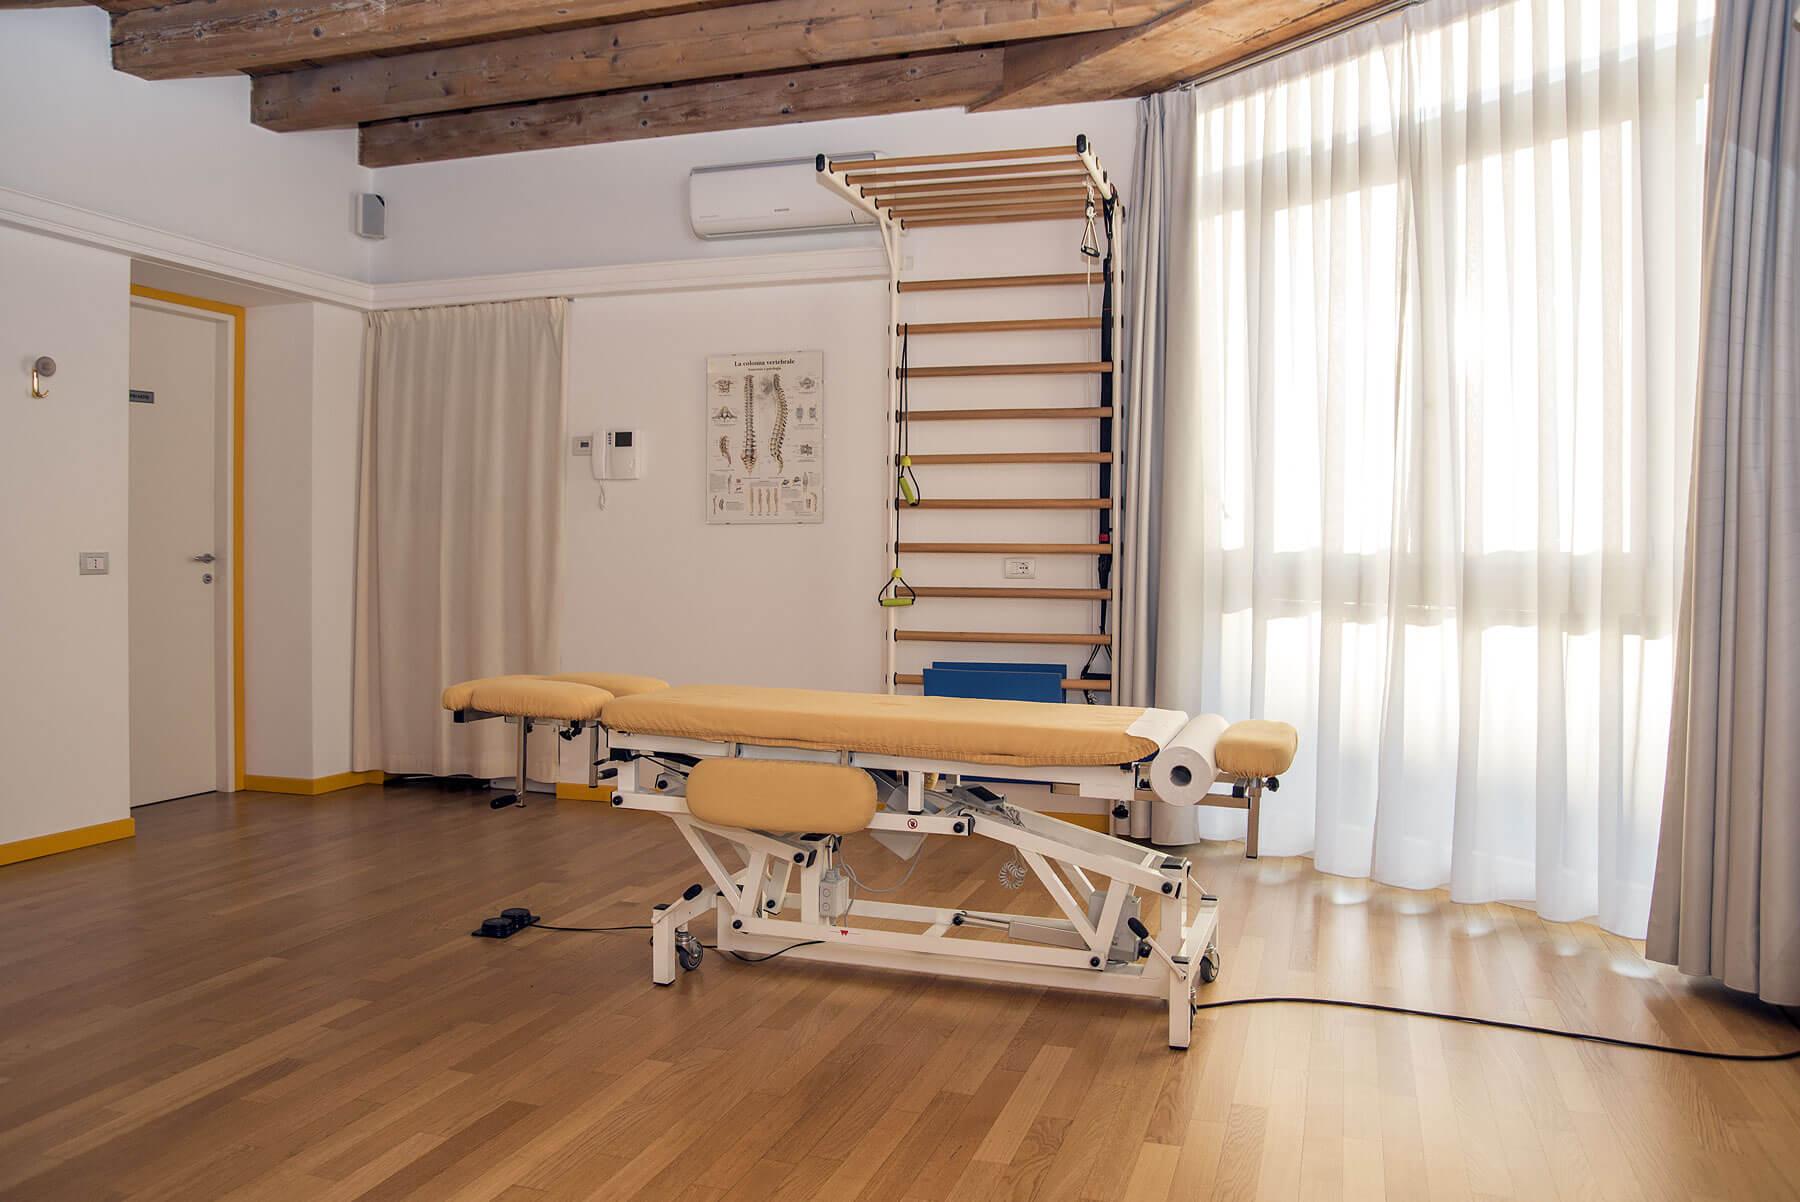 Studio fisioterapista verona